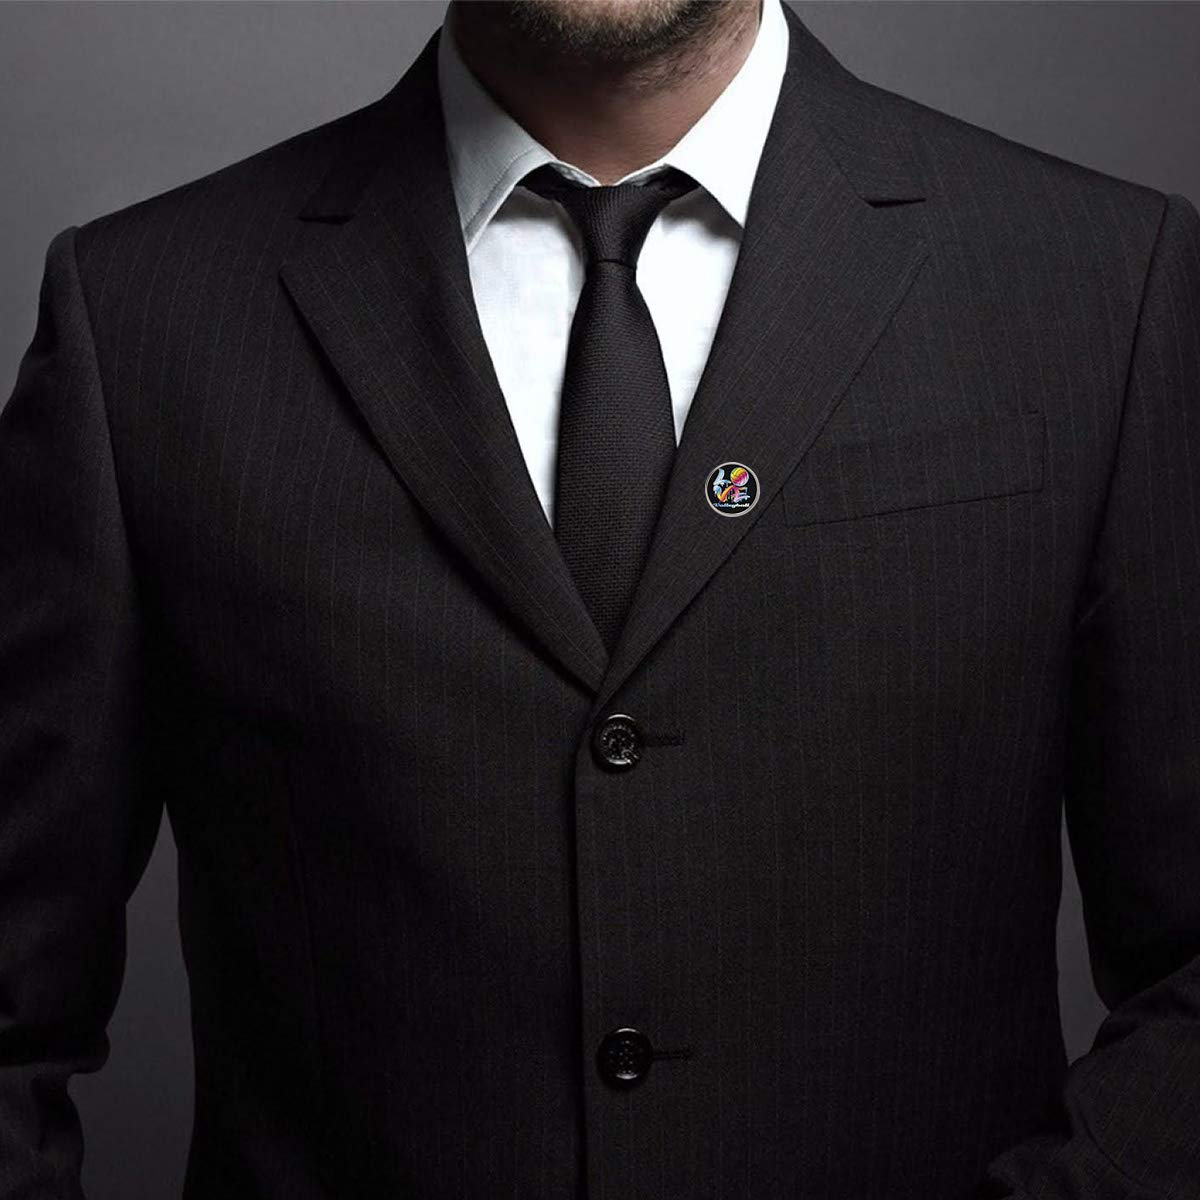 Custom Lapel Pin Brooches I Love Volleyball Banquet Badge Pins Trendy Accessory Jacket T-Shirt Bag Hat Shoe